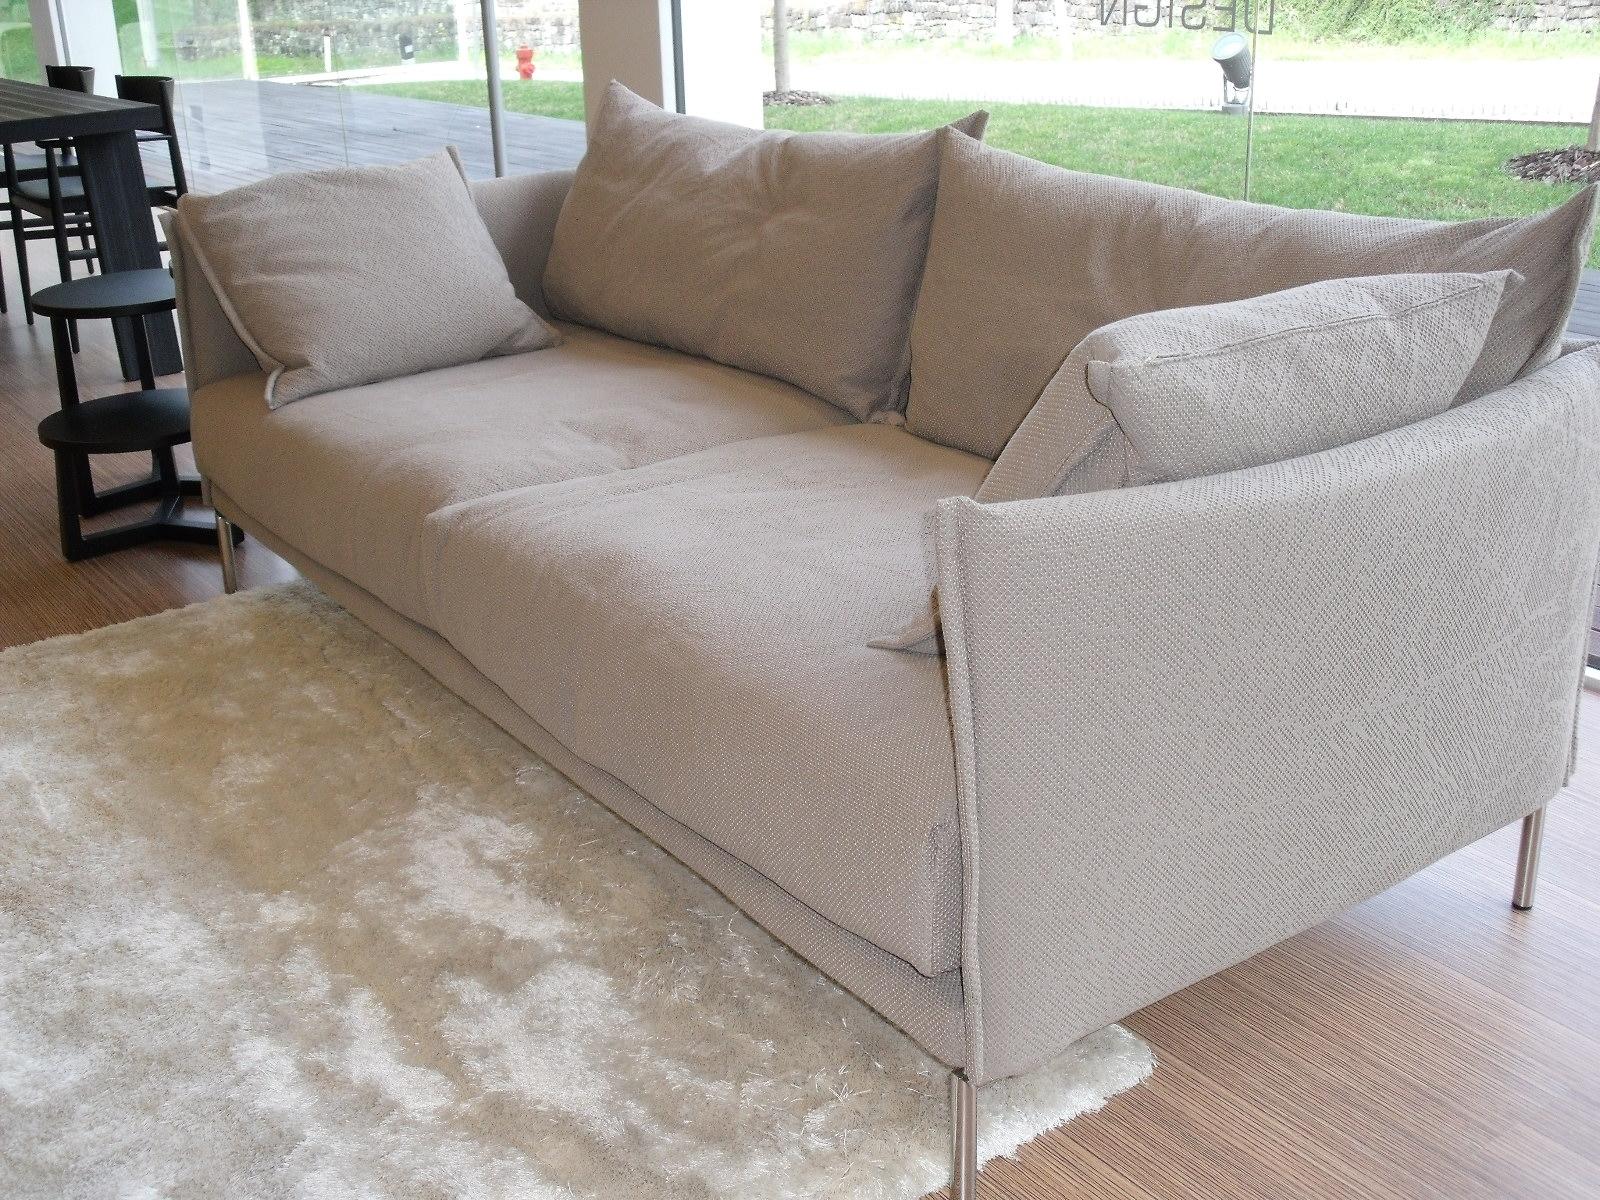 Moroso divano gentry tessuto divani a prezzi scontati for Divano tessuto